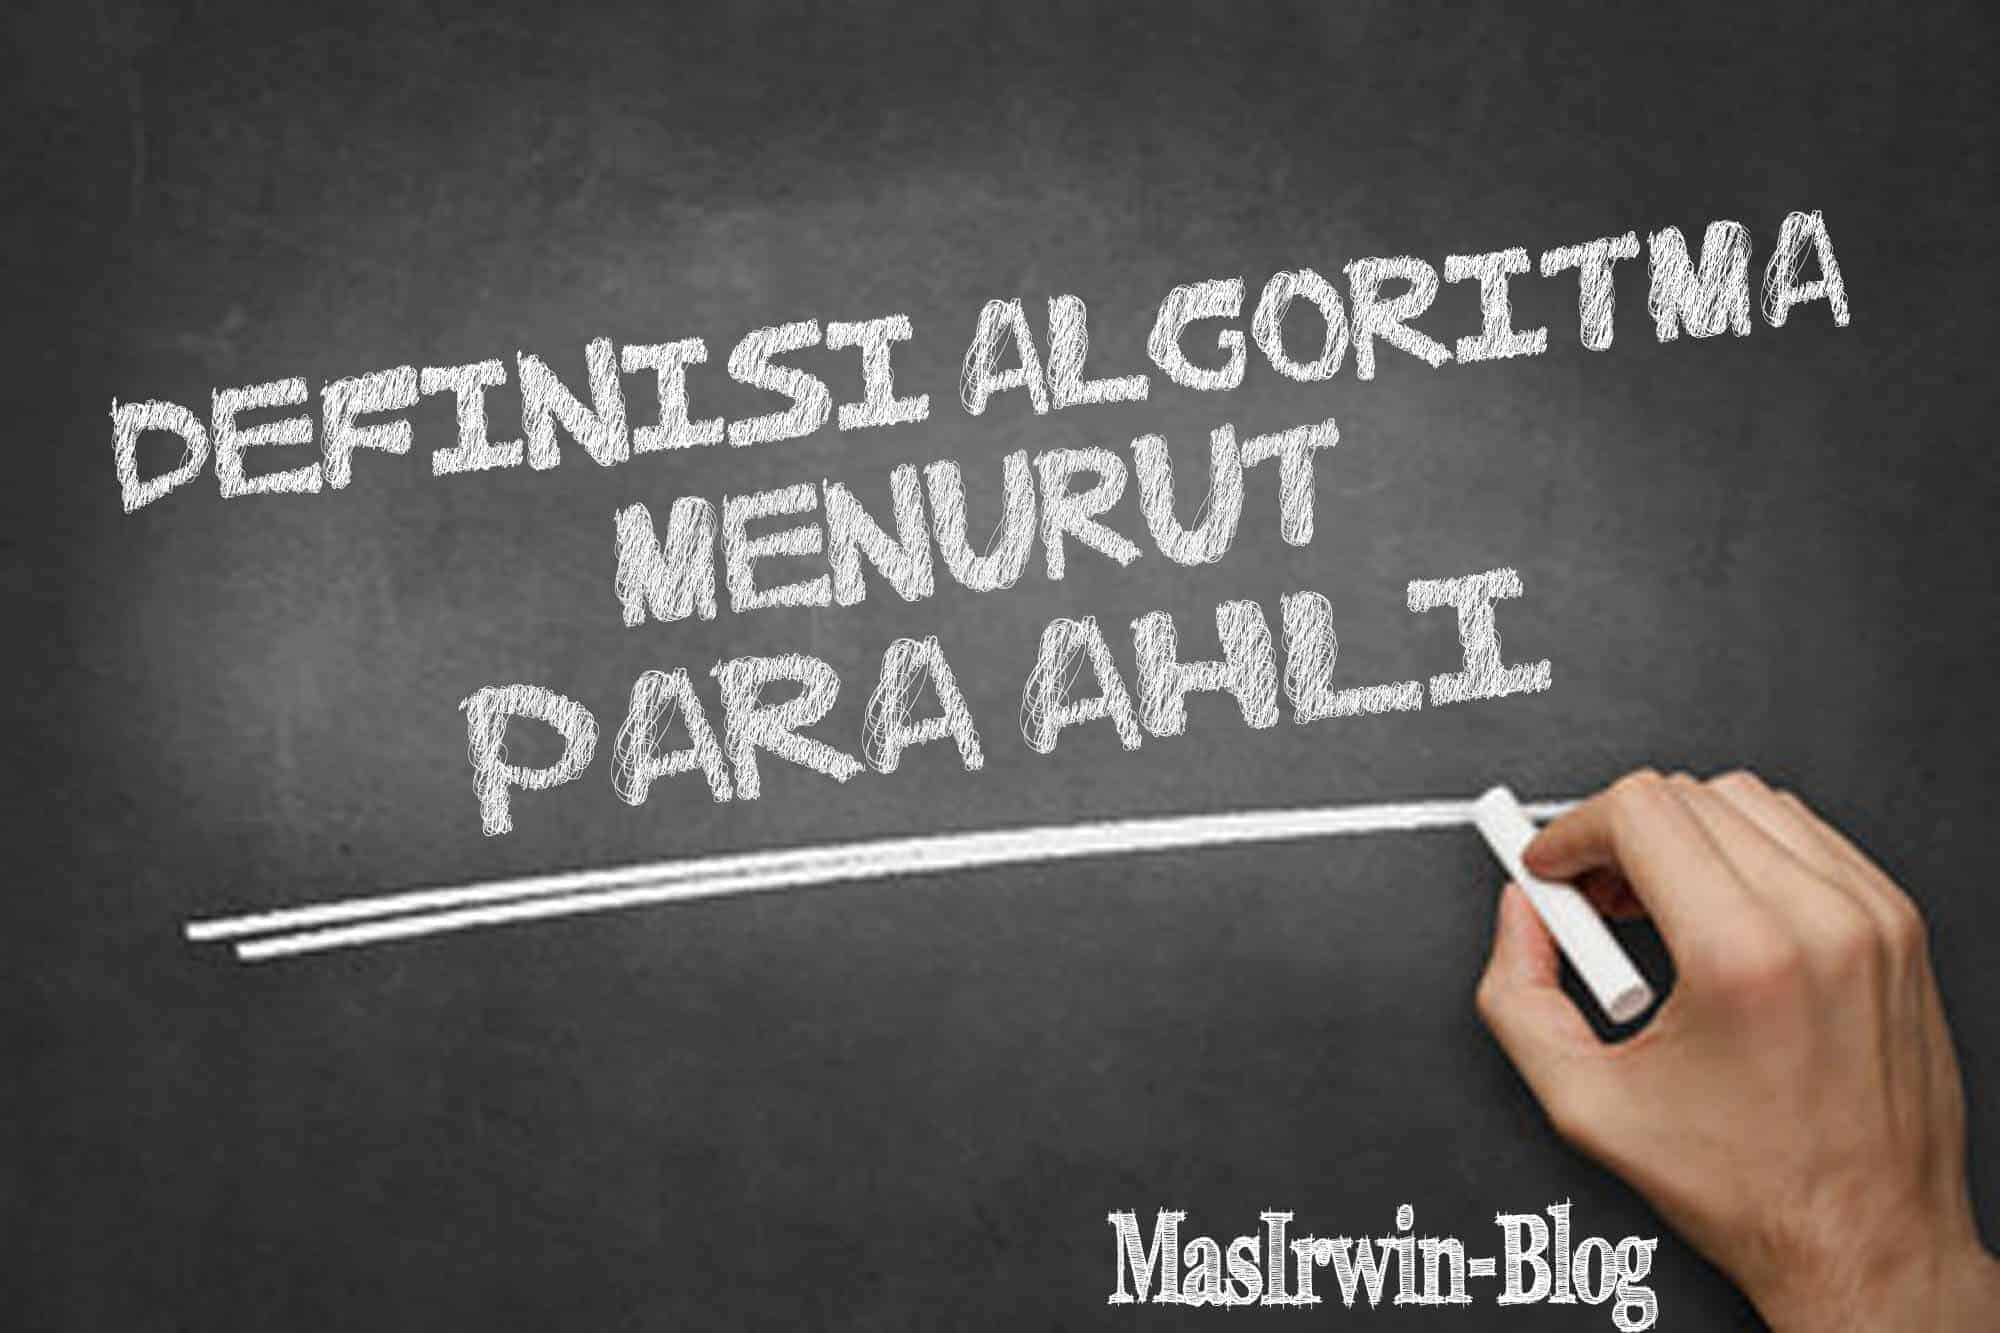 contoh algoritma adalah, contoh algoritma array 2 dimensi, contoh algoritma c , contoh algoritma c4.5, contoh algoritma caesar cipher, contoh algoritma cara membuat nasi goreng, contoh algoritma cipher transposisi, contoh algoritma clustering, contoh algoritma elgamal, contoh algoritma enkripsi, contoh algoritma euclid, contoh algoritma euclidean, contoh algoritma flowchart, contoh algoritma flowchart dalam kehidupan sehari-hari, contoh algoritma game, contoh algoritma generate and test, contoh algoritma genetika, contoh algoritma genetika dalam kehidupan sehari hari, contoh algoritma greedy, contoh algoritma greedy dalam kehidupan sehari-hari, contoh algoritma hash, contoh algoritma heap sort, contoh algoritma heuristik, contoh algoritma hill climbing, contoh algoritma hitung diskon, contoh algoritma hrn (highest ratio next), contoh algoritma if else, contoh algoritma if else c , contoh algoritma if then else, contoh algoritma informatika, contoh algoritma input output, contoh algoritma insertion sort, contoh algoritma jalur terpendek, contoh algoritma java, contoh algoritma judul deklarasi deskripsi, contoh algoritma lengkap, contoh algoritma looping, contoh algoritma looping dalam kehidupan sehari hari, contoh algoritma luas segitiga, contoh algoritma naive bayes, contoh algoritma natural, contoh algoritma natural language, contoh algoritma one time pad, contoh algoritma oop, contoh algoritma optimal, contoh algoritma optimasi, contoh algoritma quicksort, contoh algoritma runtunan, contoh algoritma runtunan dalam kehidupan sehari-hari, contoh algoritma tentang pembelajaran daring, contoh algoritma tidur, contoh algoritma tik, contoh algoritma tipe data char, contoh algoritma tipe data string, contoh algoritma transform and conquer dengan instance simplification, contoh algoritma unsupervised learning, contoh algoritma untuk memeriksa integritas file adalah, contoh algoritma untuk mencari akar persamaan kuadrat, contoh algoritma untuk menghitung luas dan keliling 